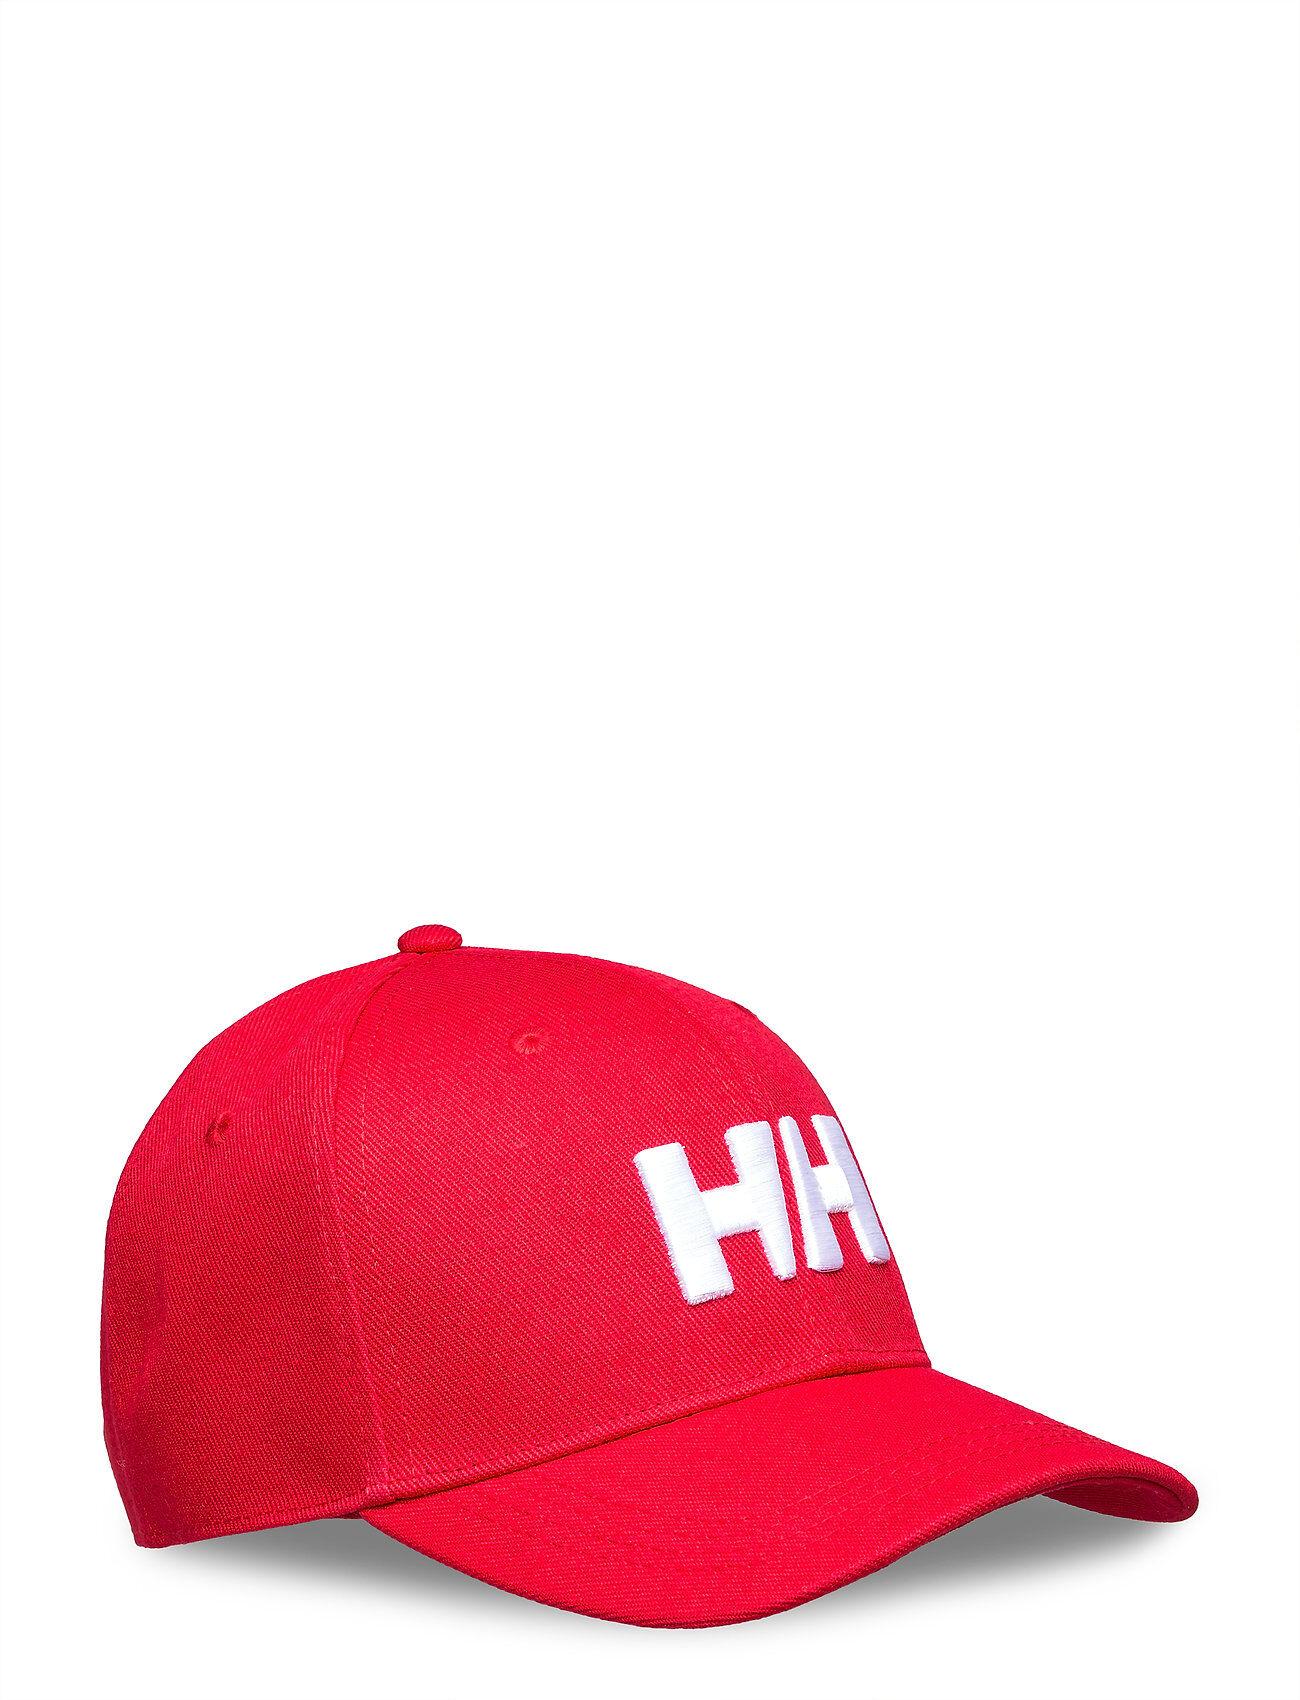 HELLY HANSEN Hh Brand Cap Lippalakki Punainen HELLY HANSEN